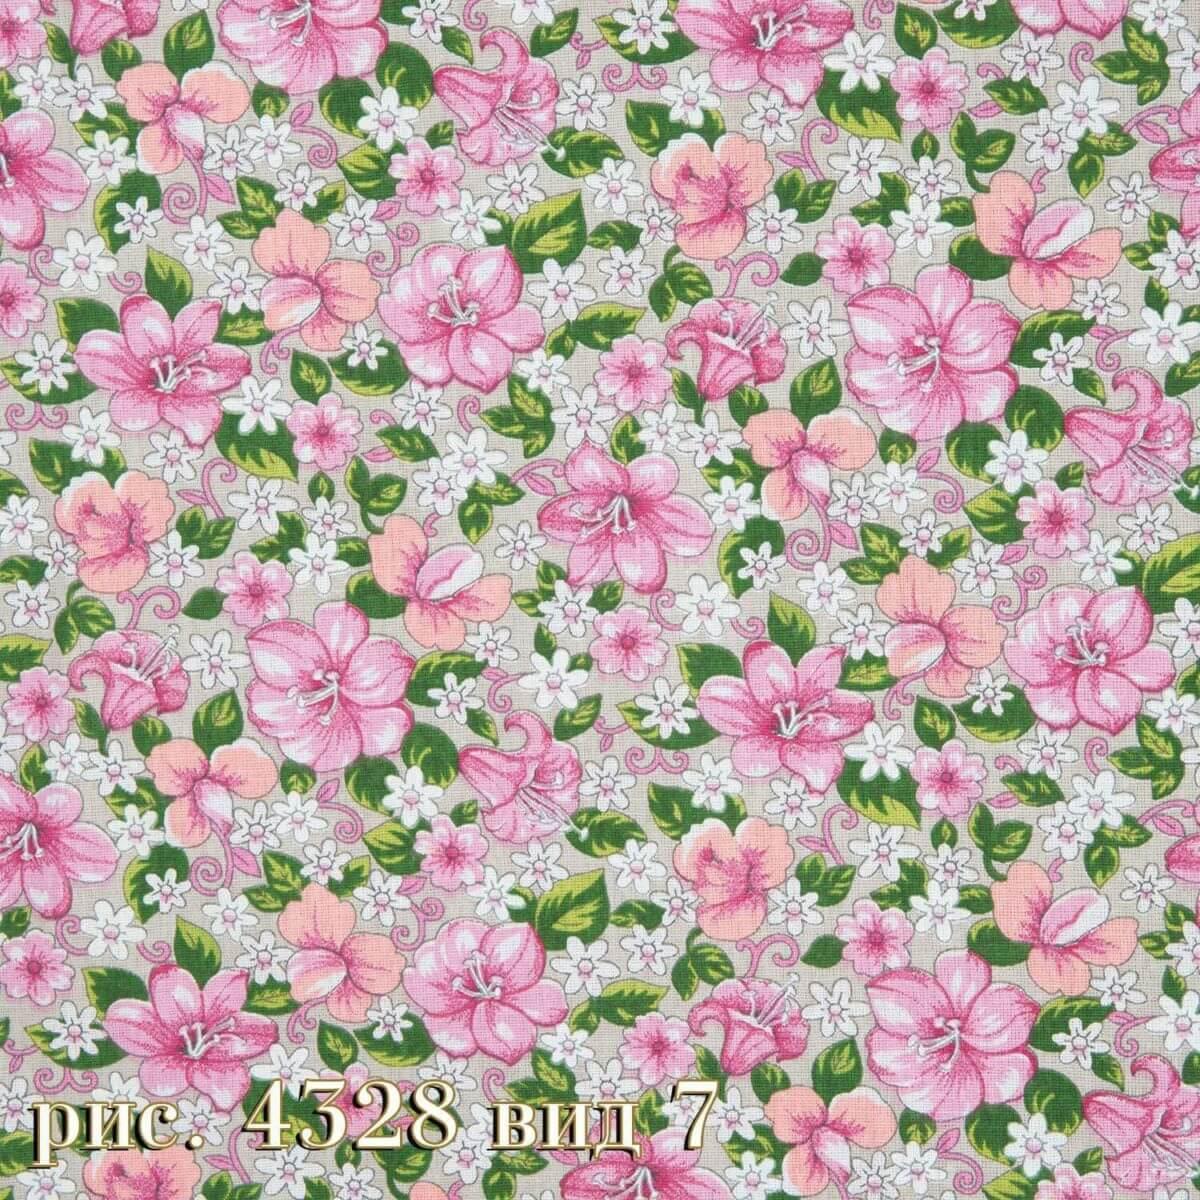 Фото 20 - Плательная ткань бязь 150 см (4328/3) Под заказ.